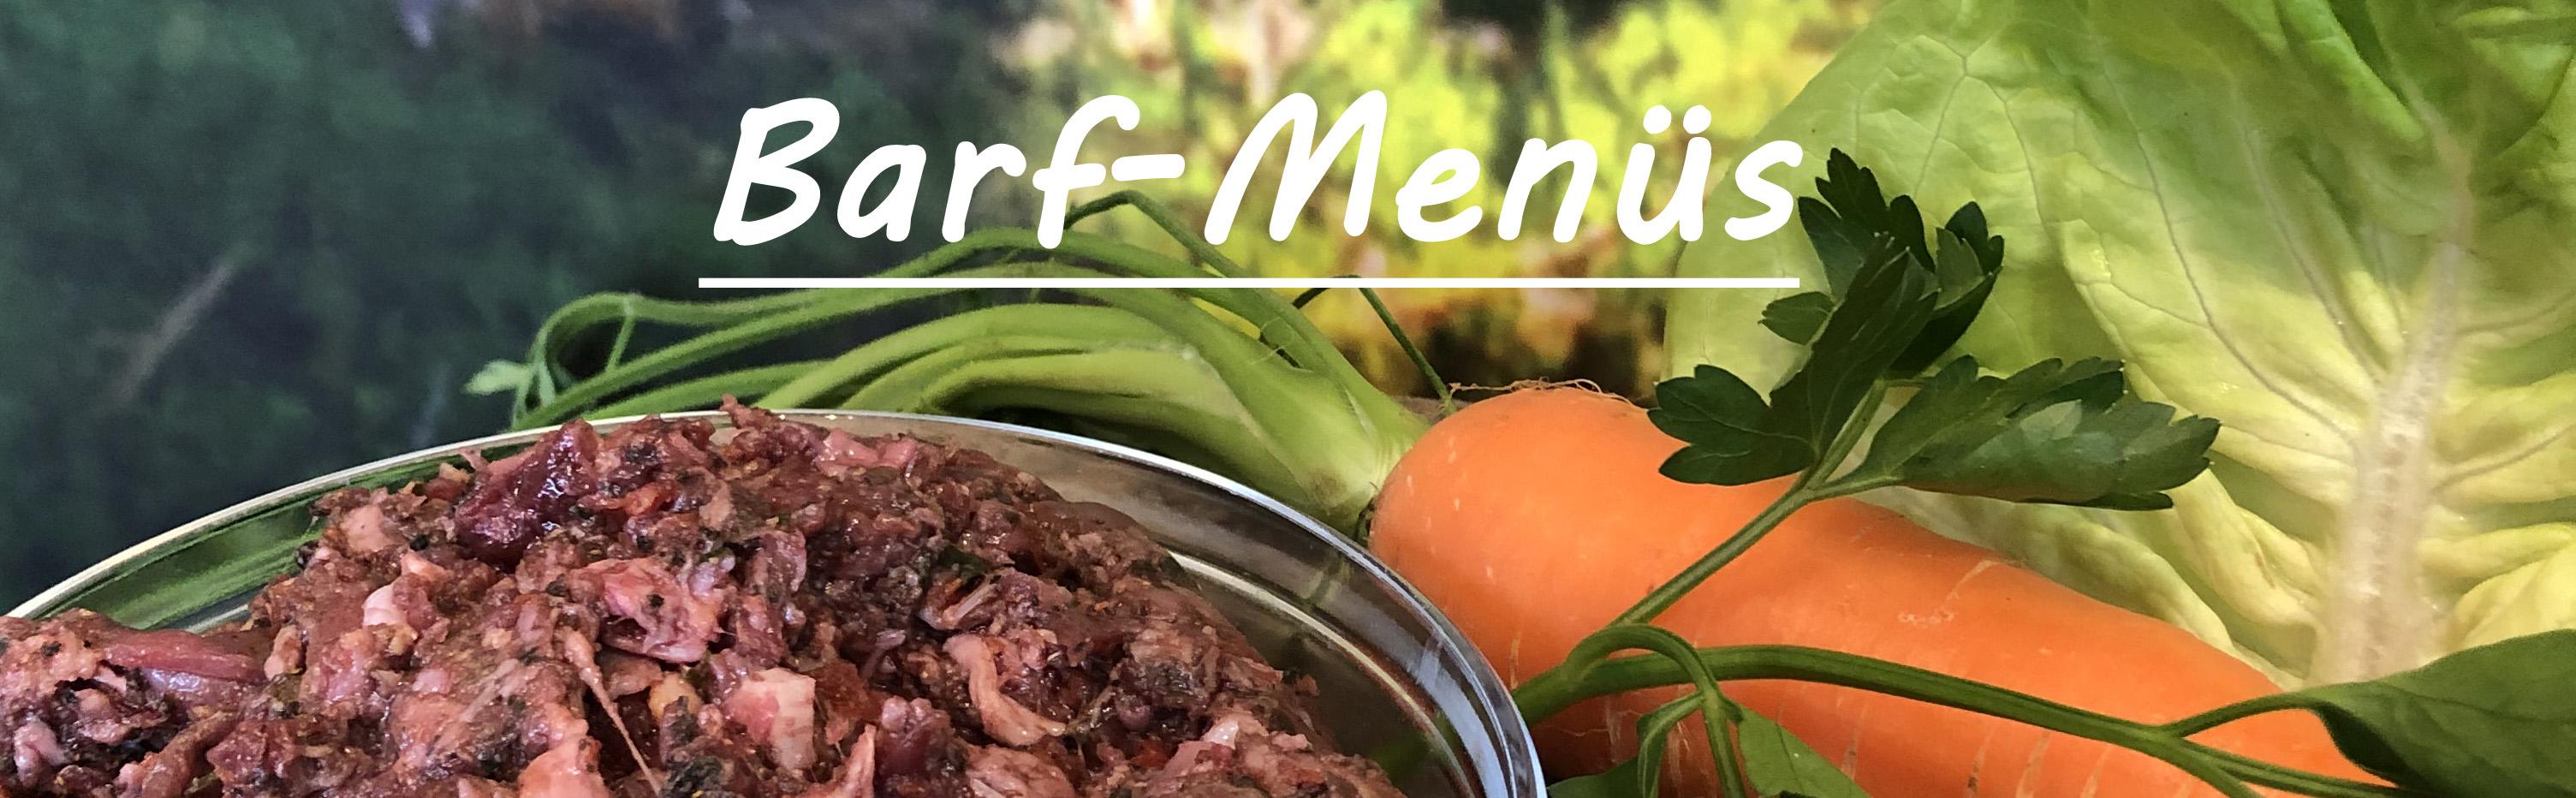 Barf Menüs